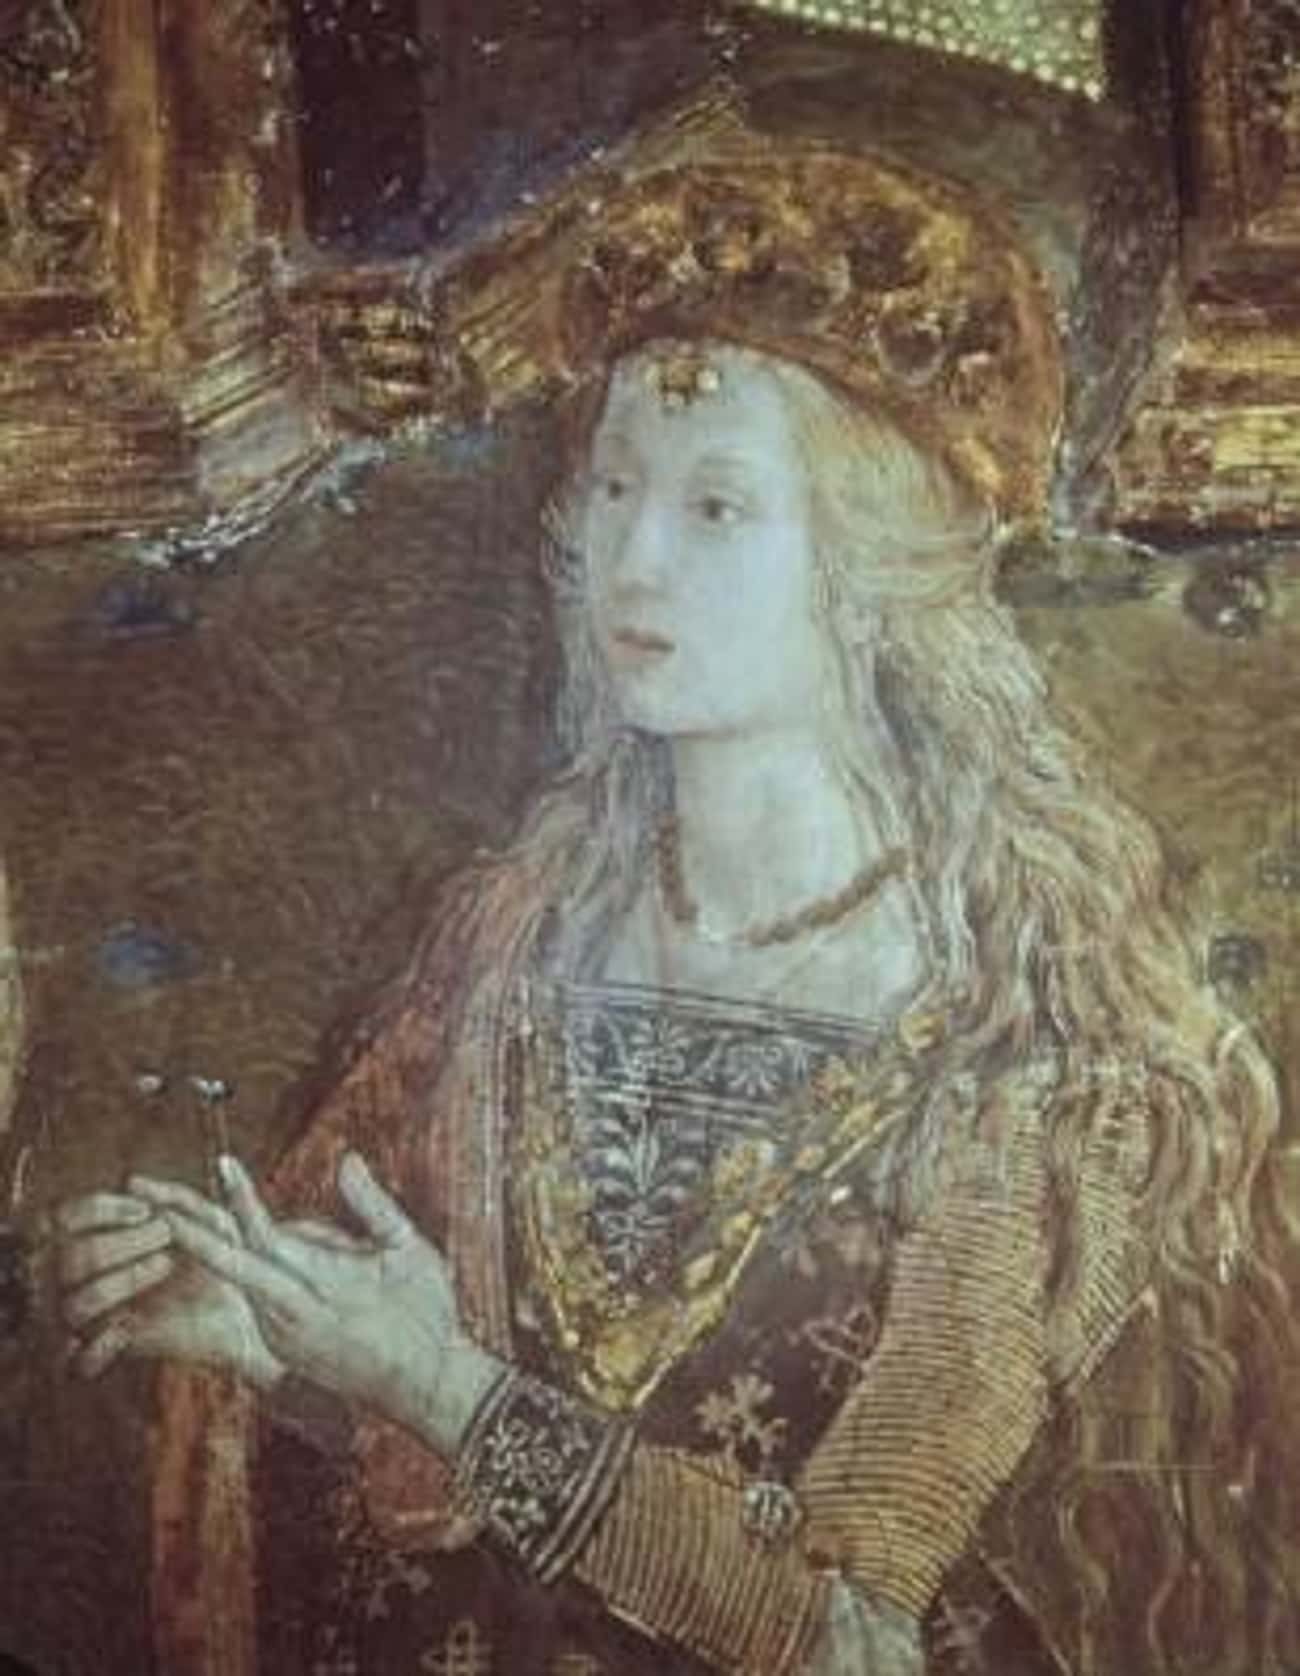 Lucrezia Borgia's Machinations May All Be Fiction